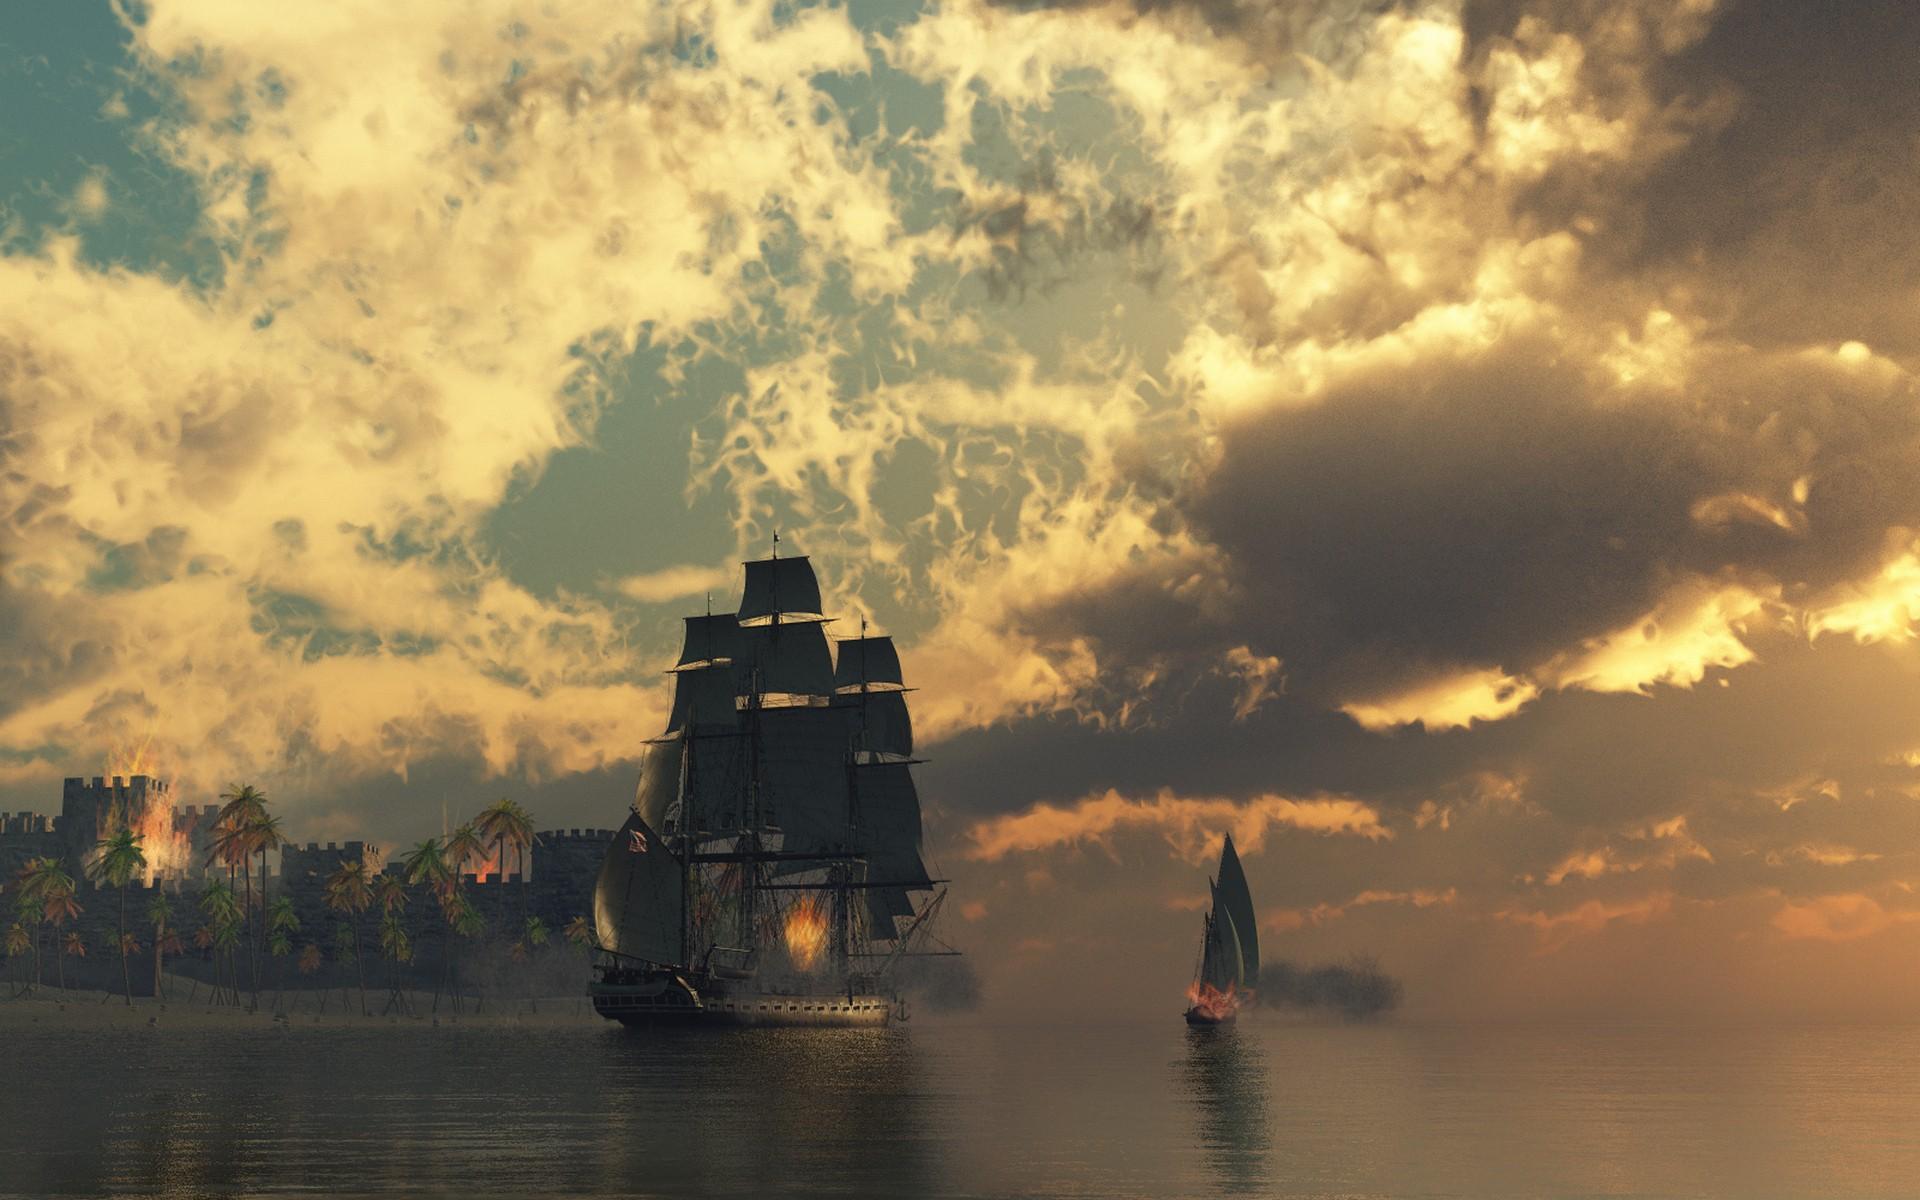 Fire ships pirates sail ship sails wallpaper 1920x1200 15225 1920x1200